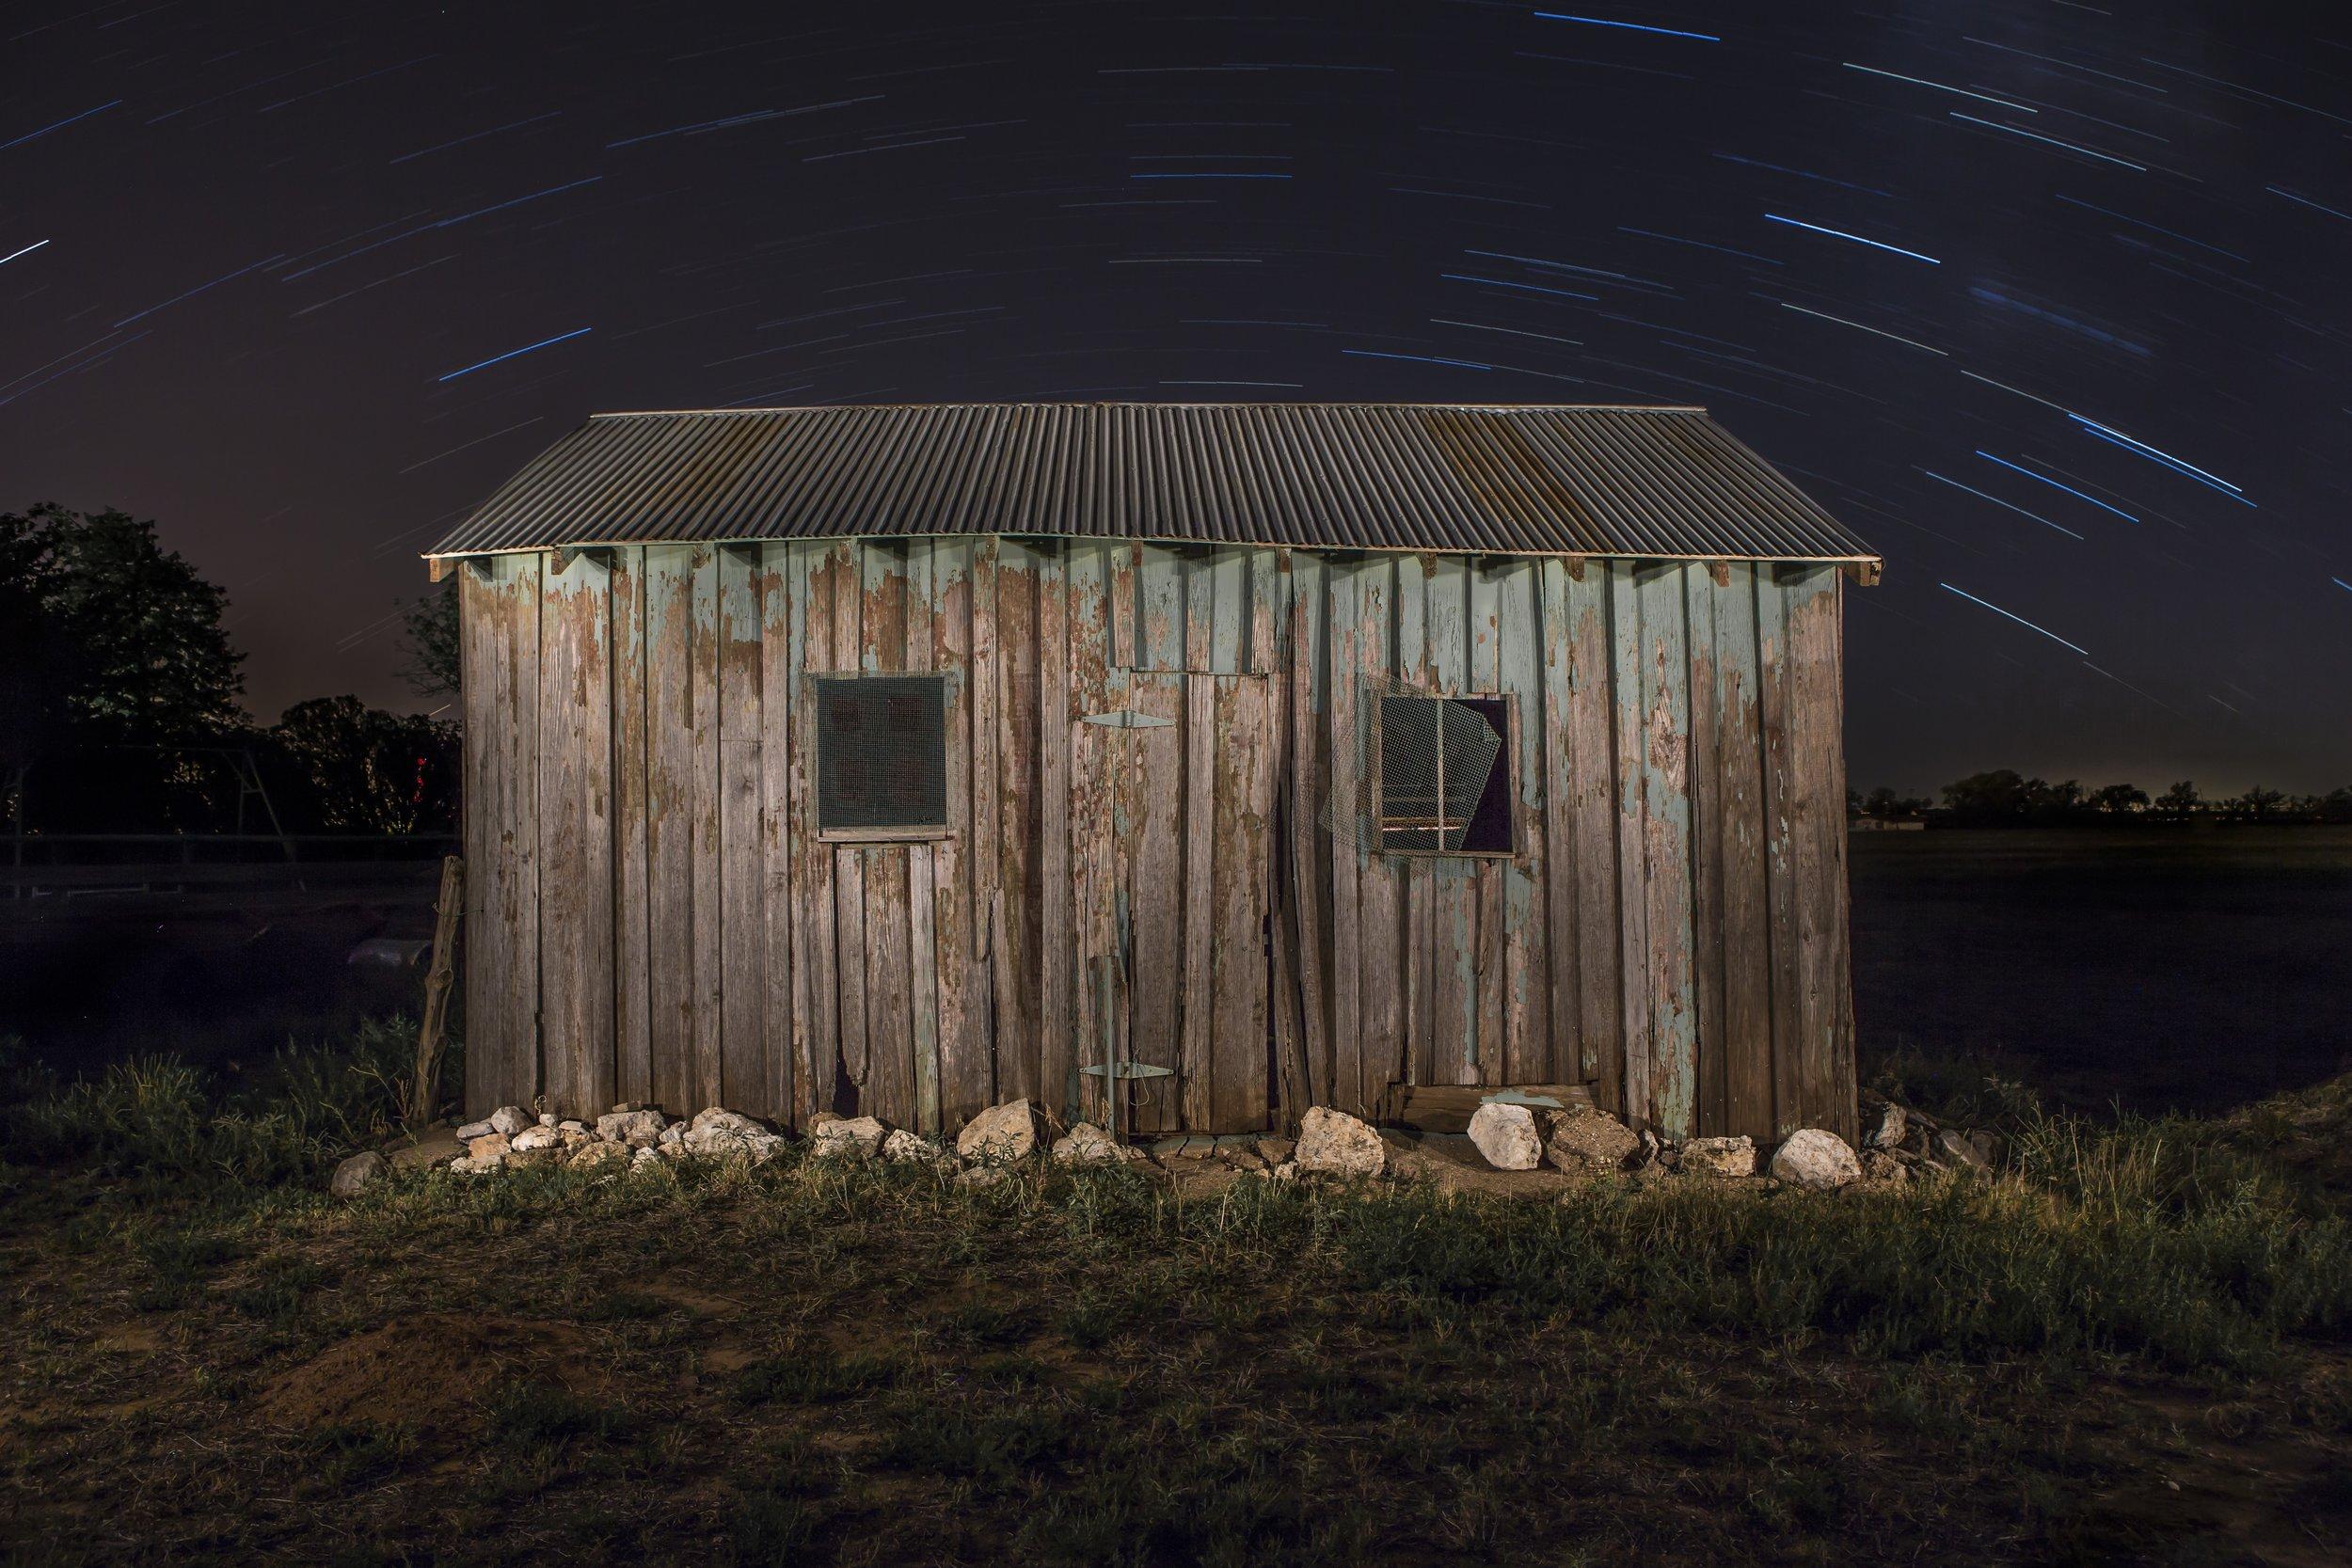 Ashton Thornhill, Arthurs Stable – Brownfield, Texas, 2013